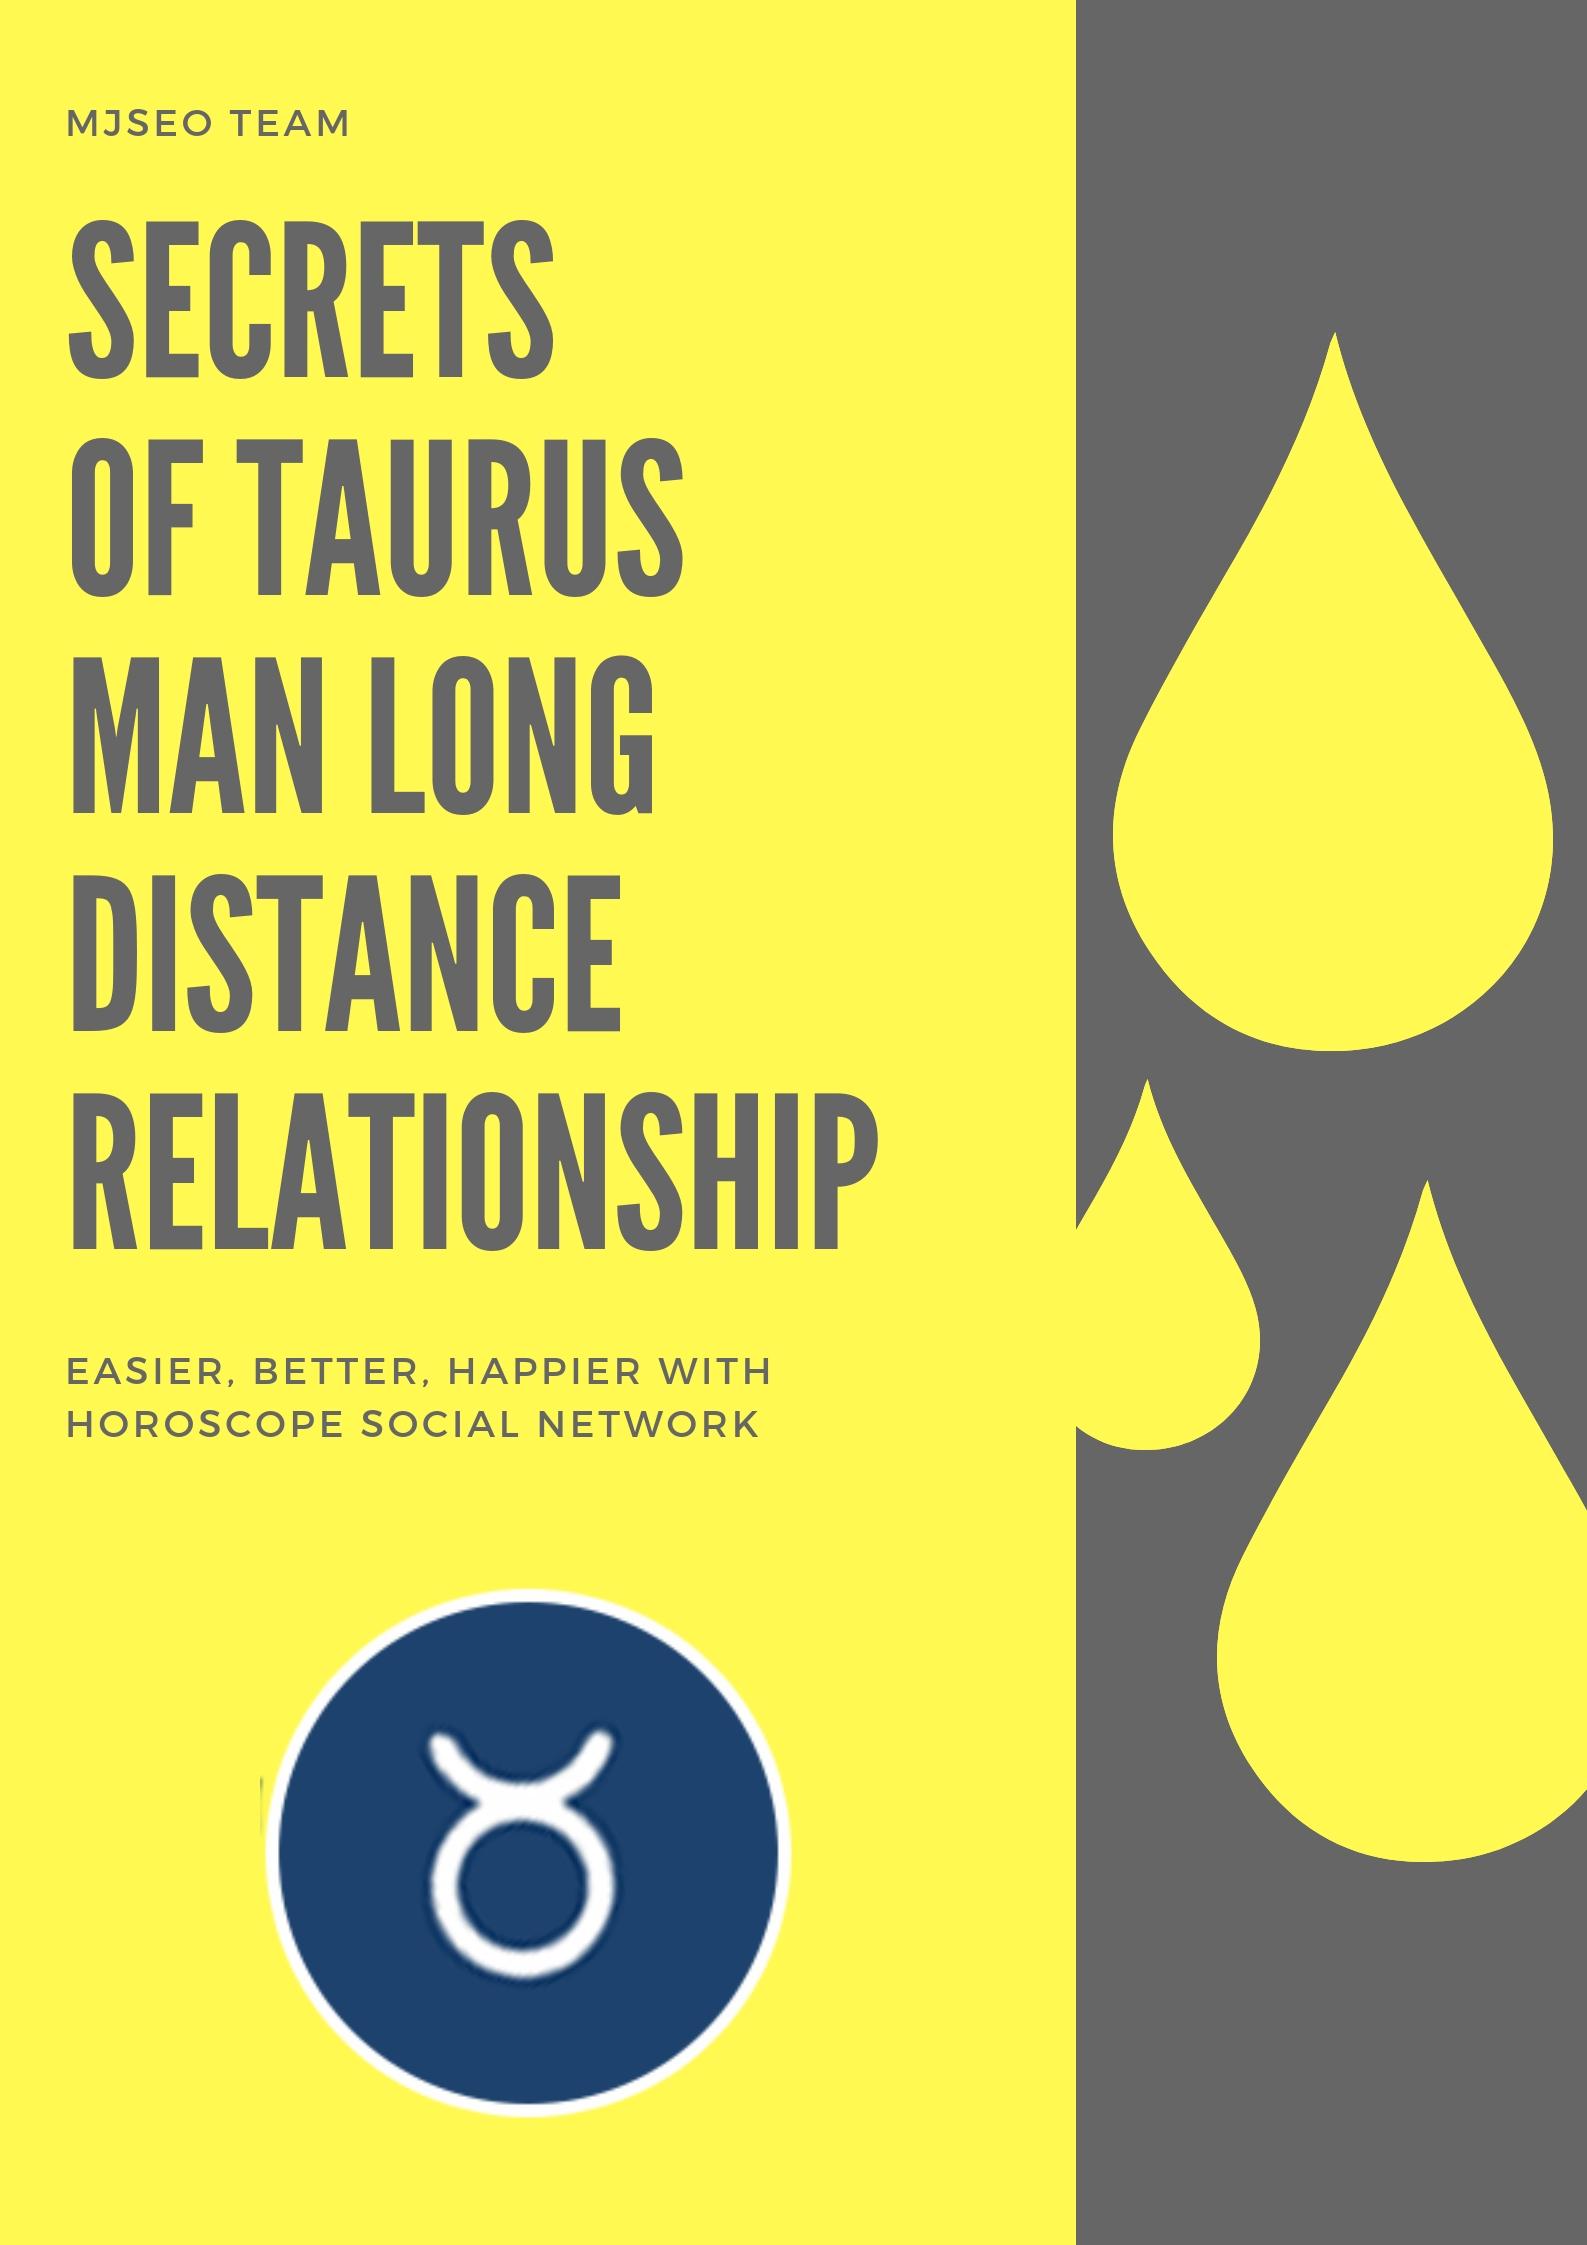 Secrets-Of-Taurus-Man-Long-Distance-Relationship